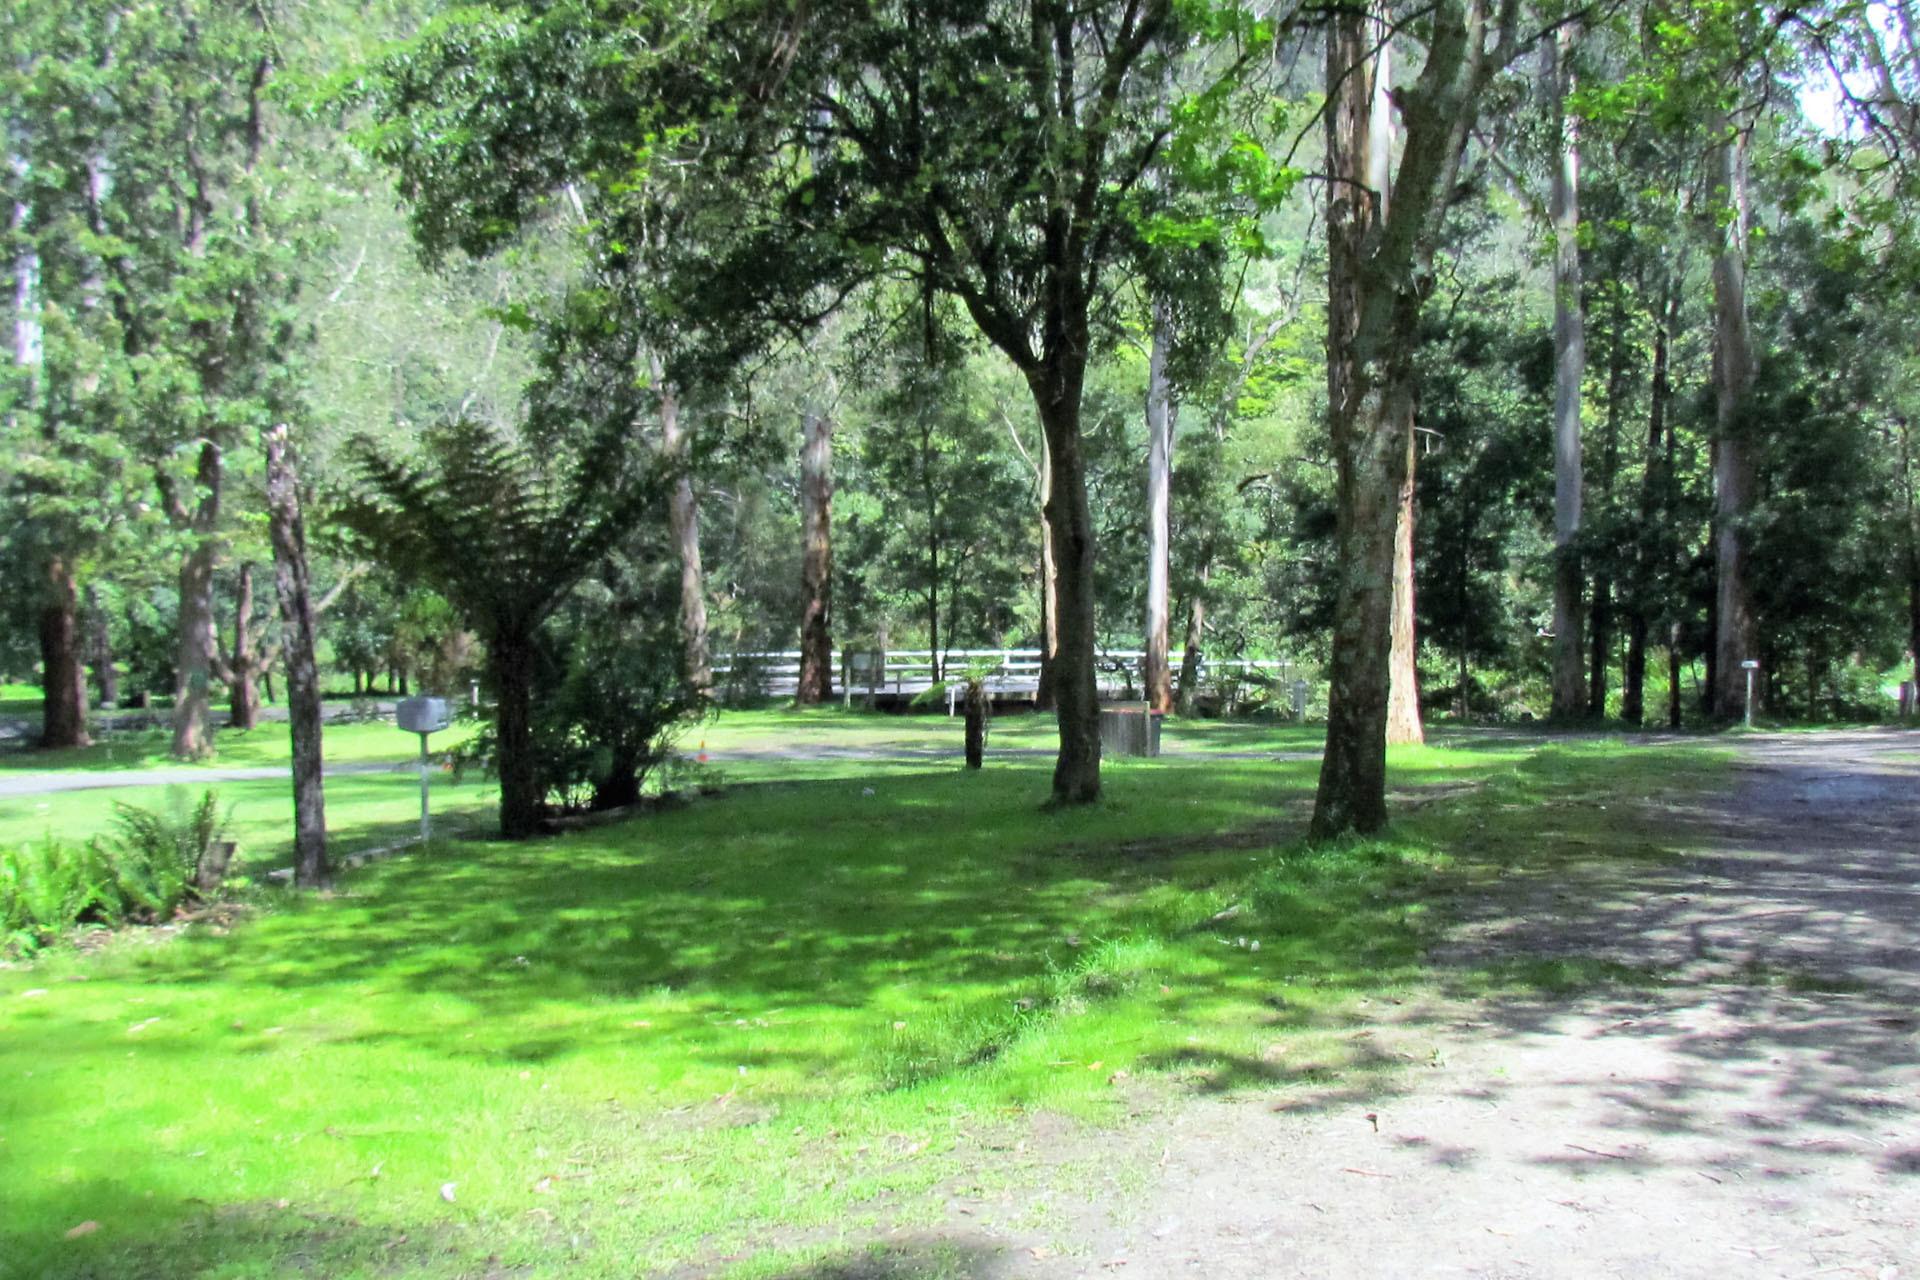 j - Tarra Valley Caravan Park